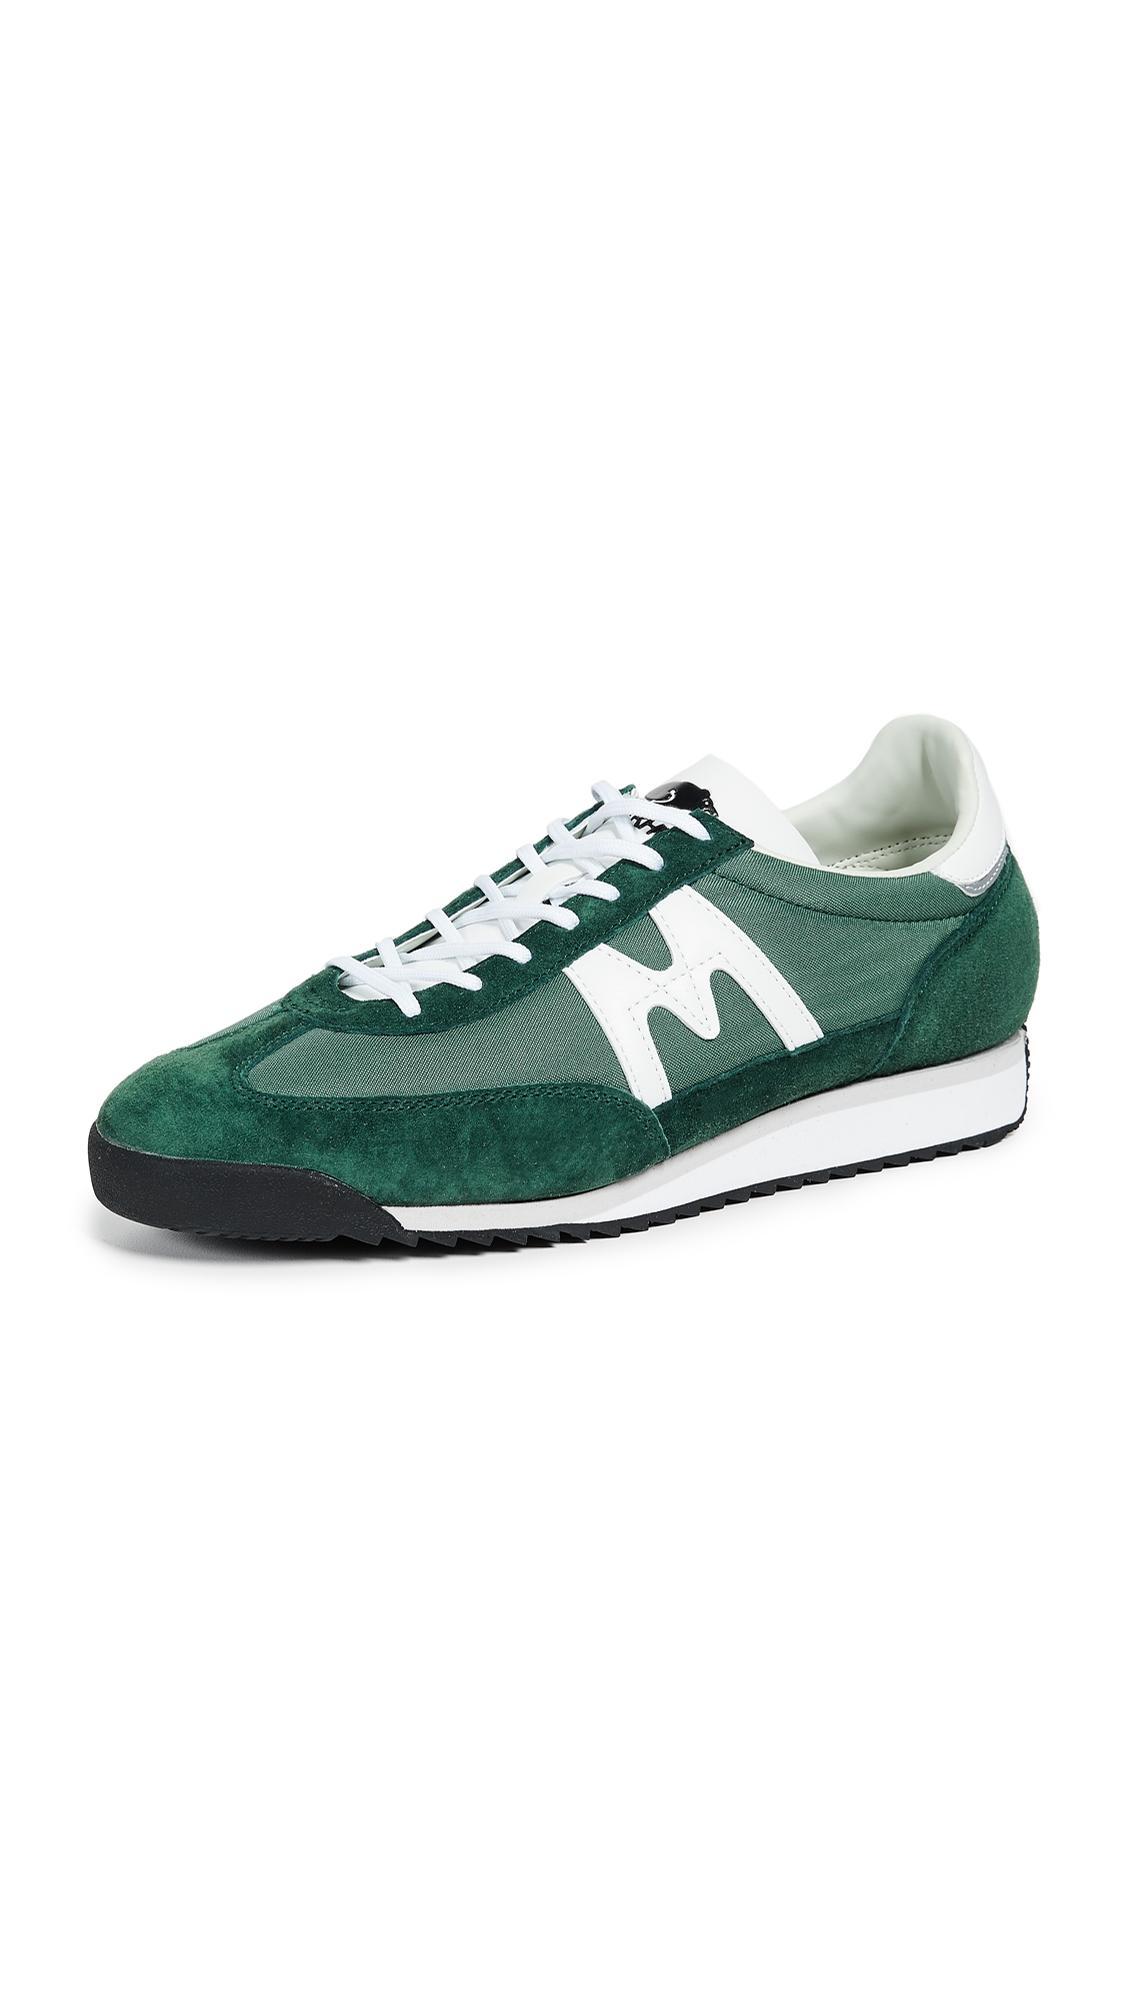 243887f059a Karhu Championair Sneakers In Green White